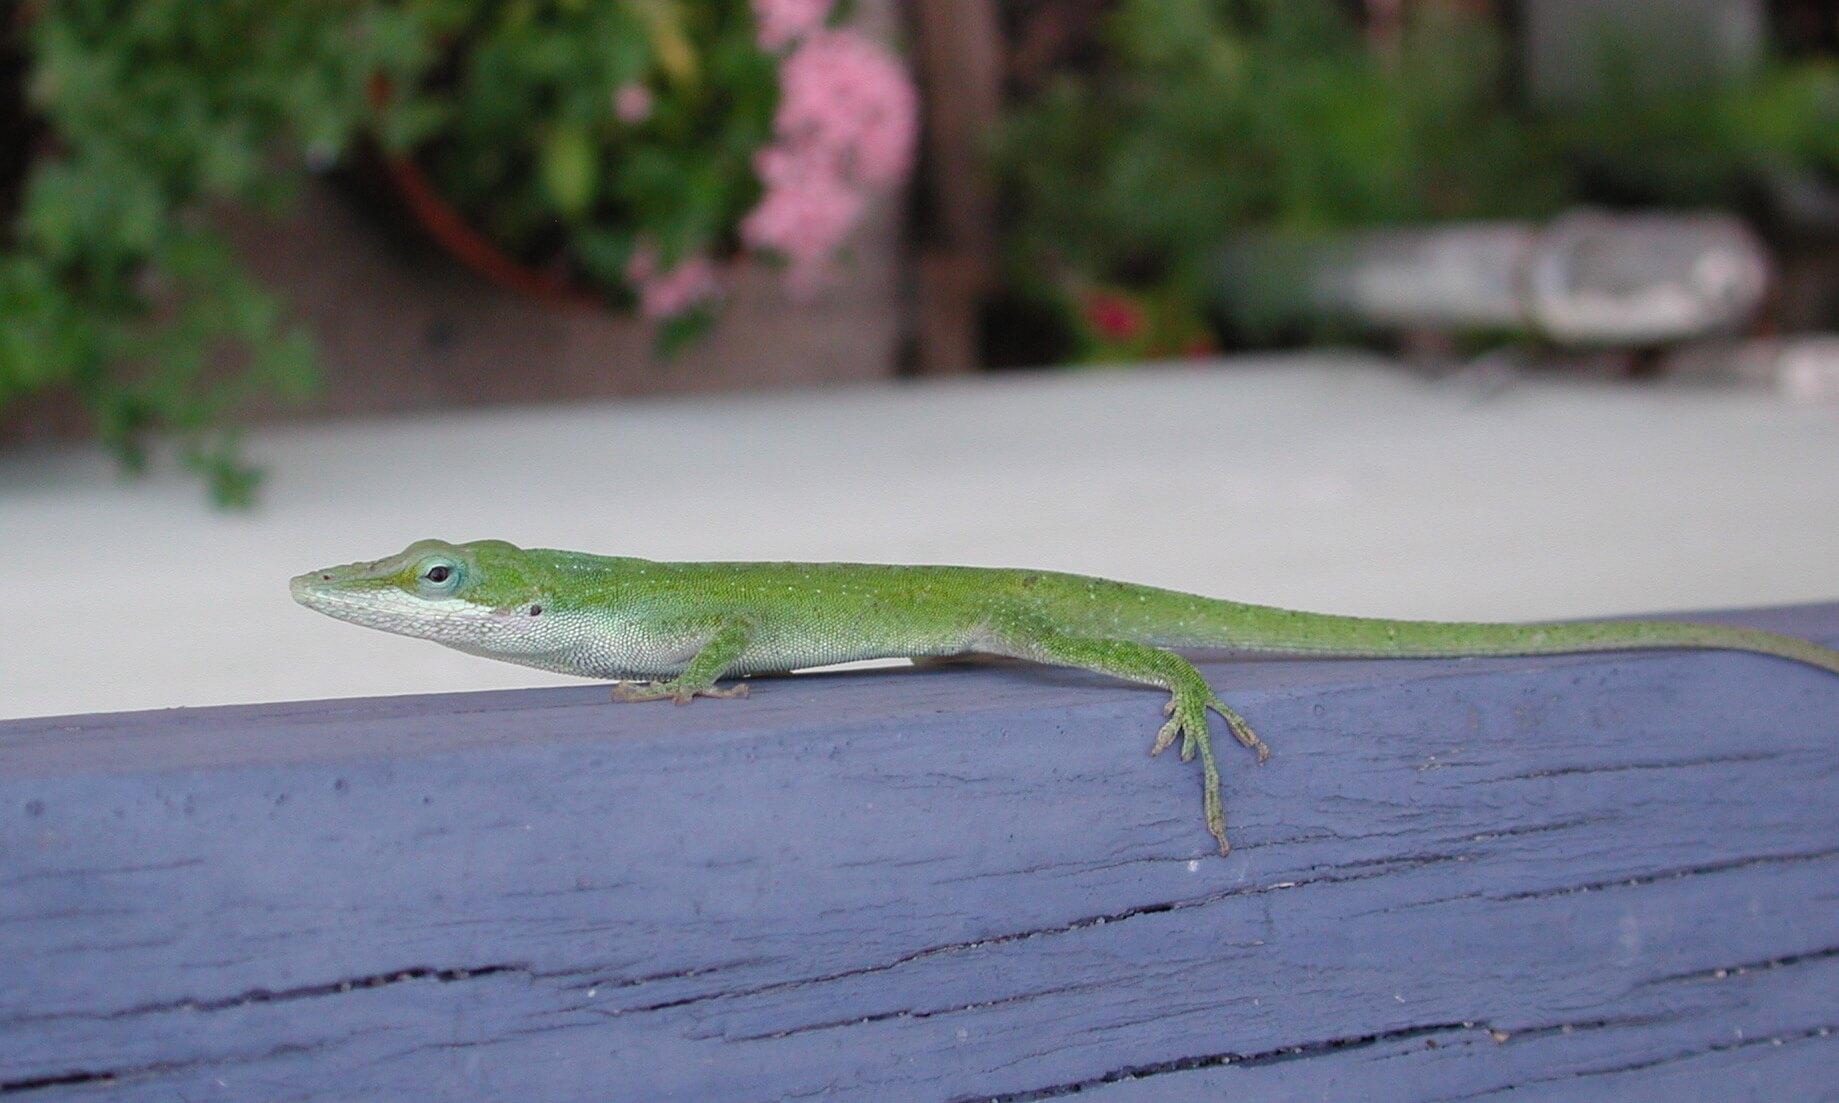 green anole lizard in dallas, texas